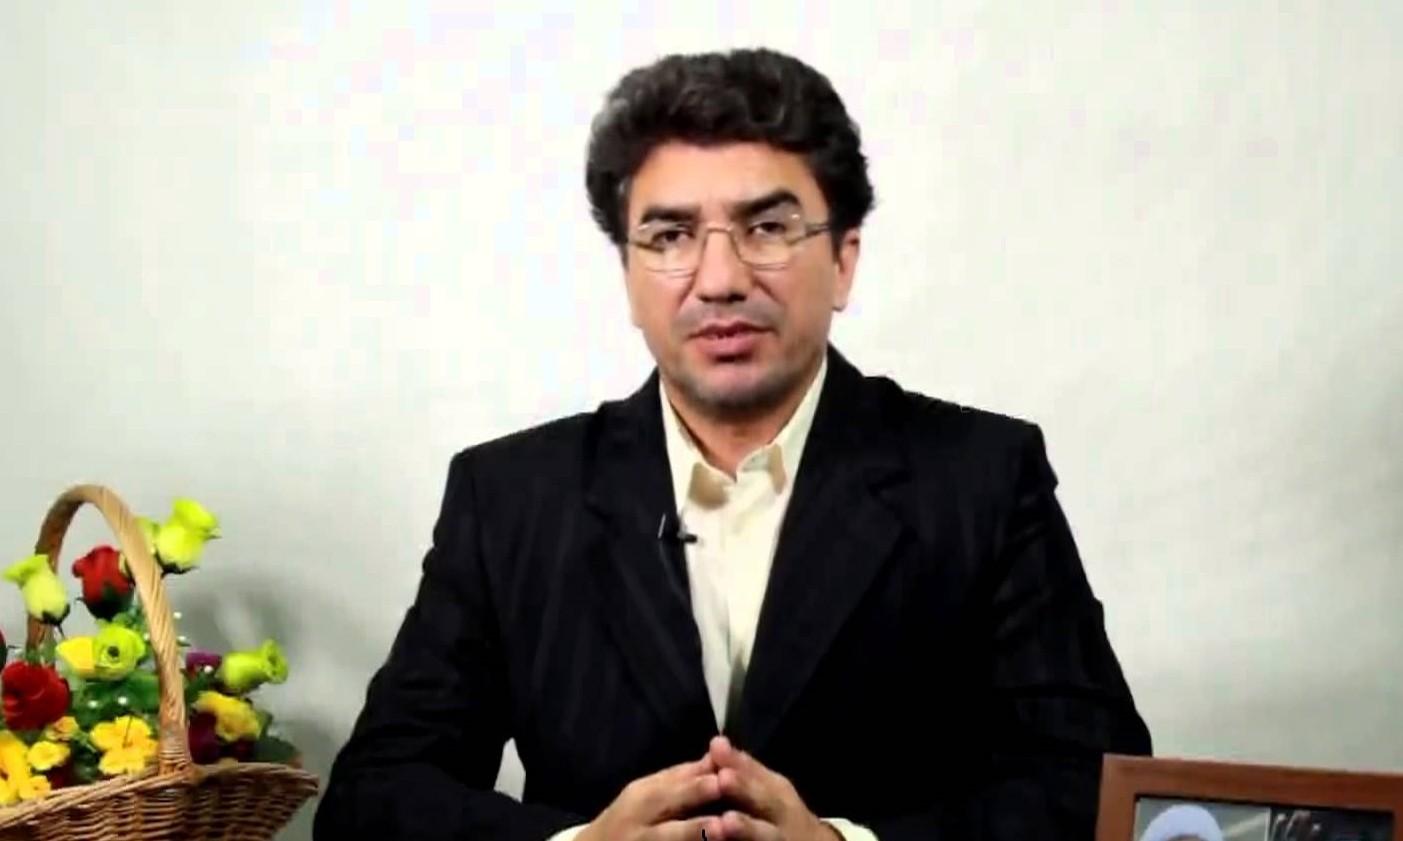 اسماعیل گرامی مقدم: مجلس مسبب و مسئول قاچاق کالاست/ سیاوش خرمگاه